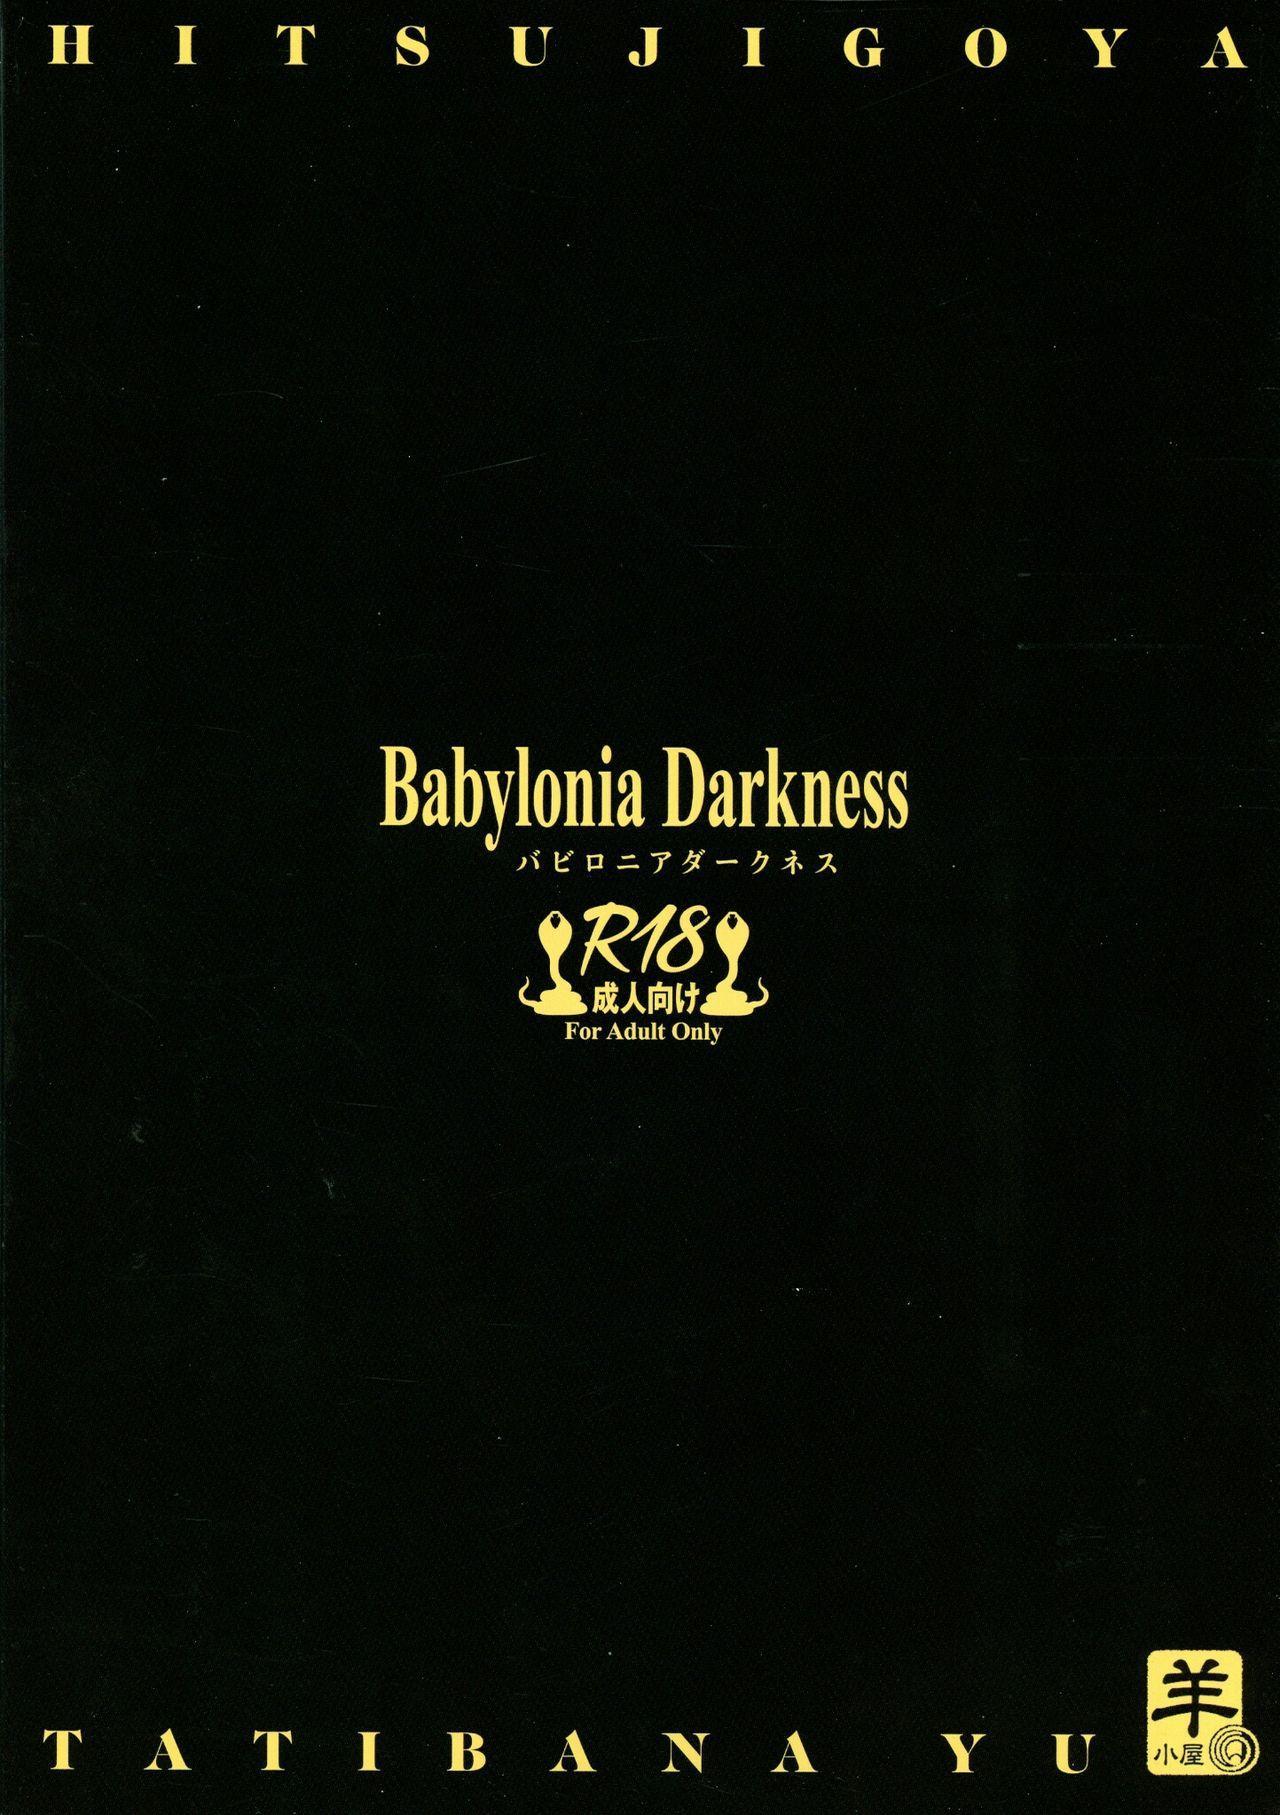 Babylonia Darkness 2